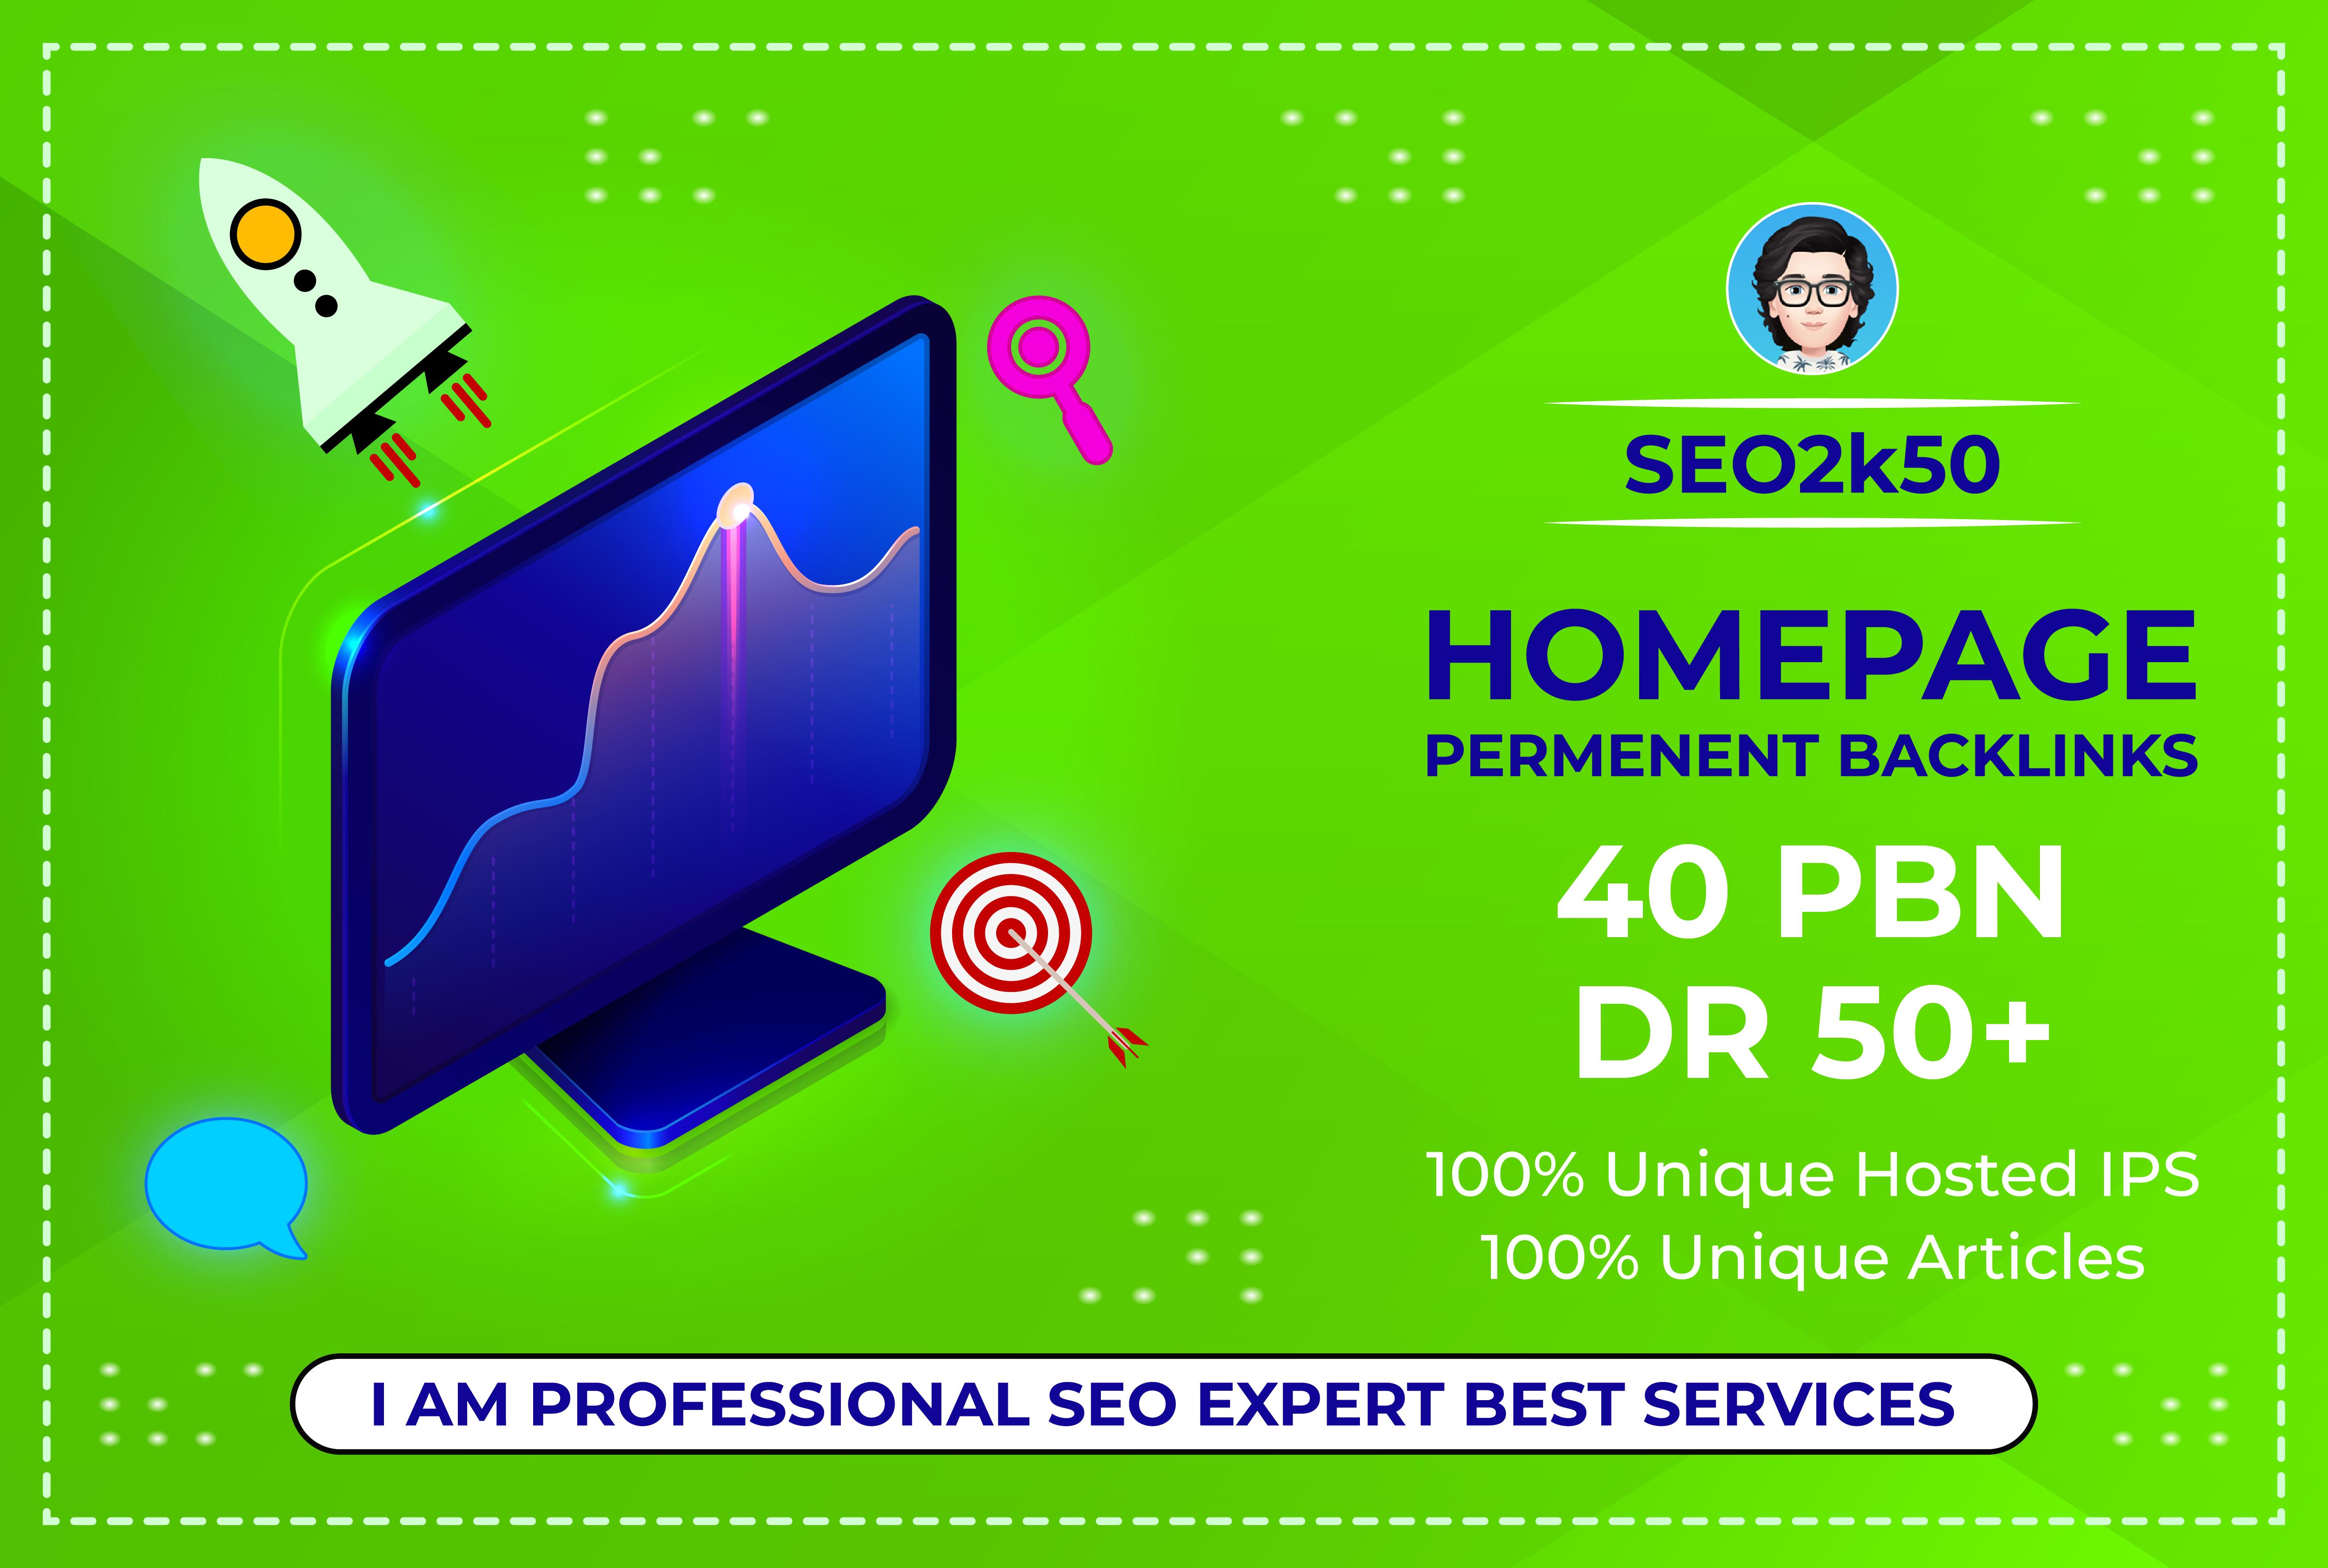 create 40 PBN Backlinks DR 50+ Dofollow Permanent